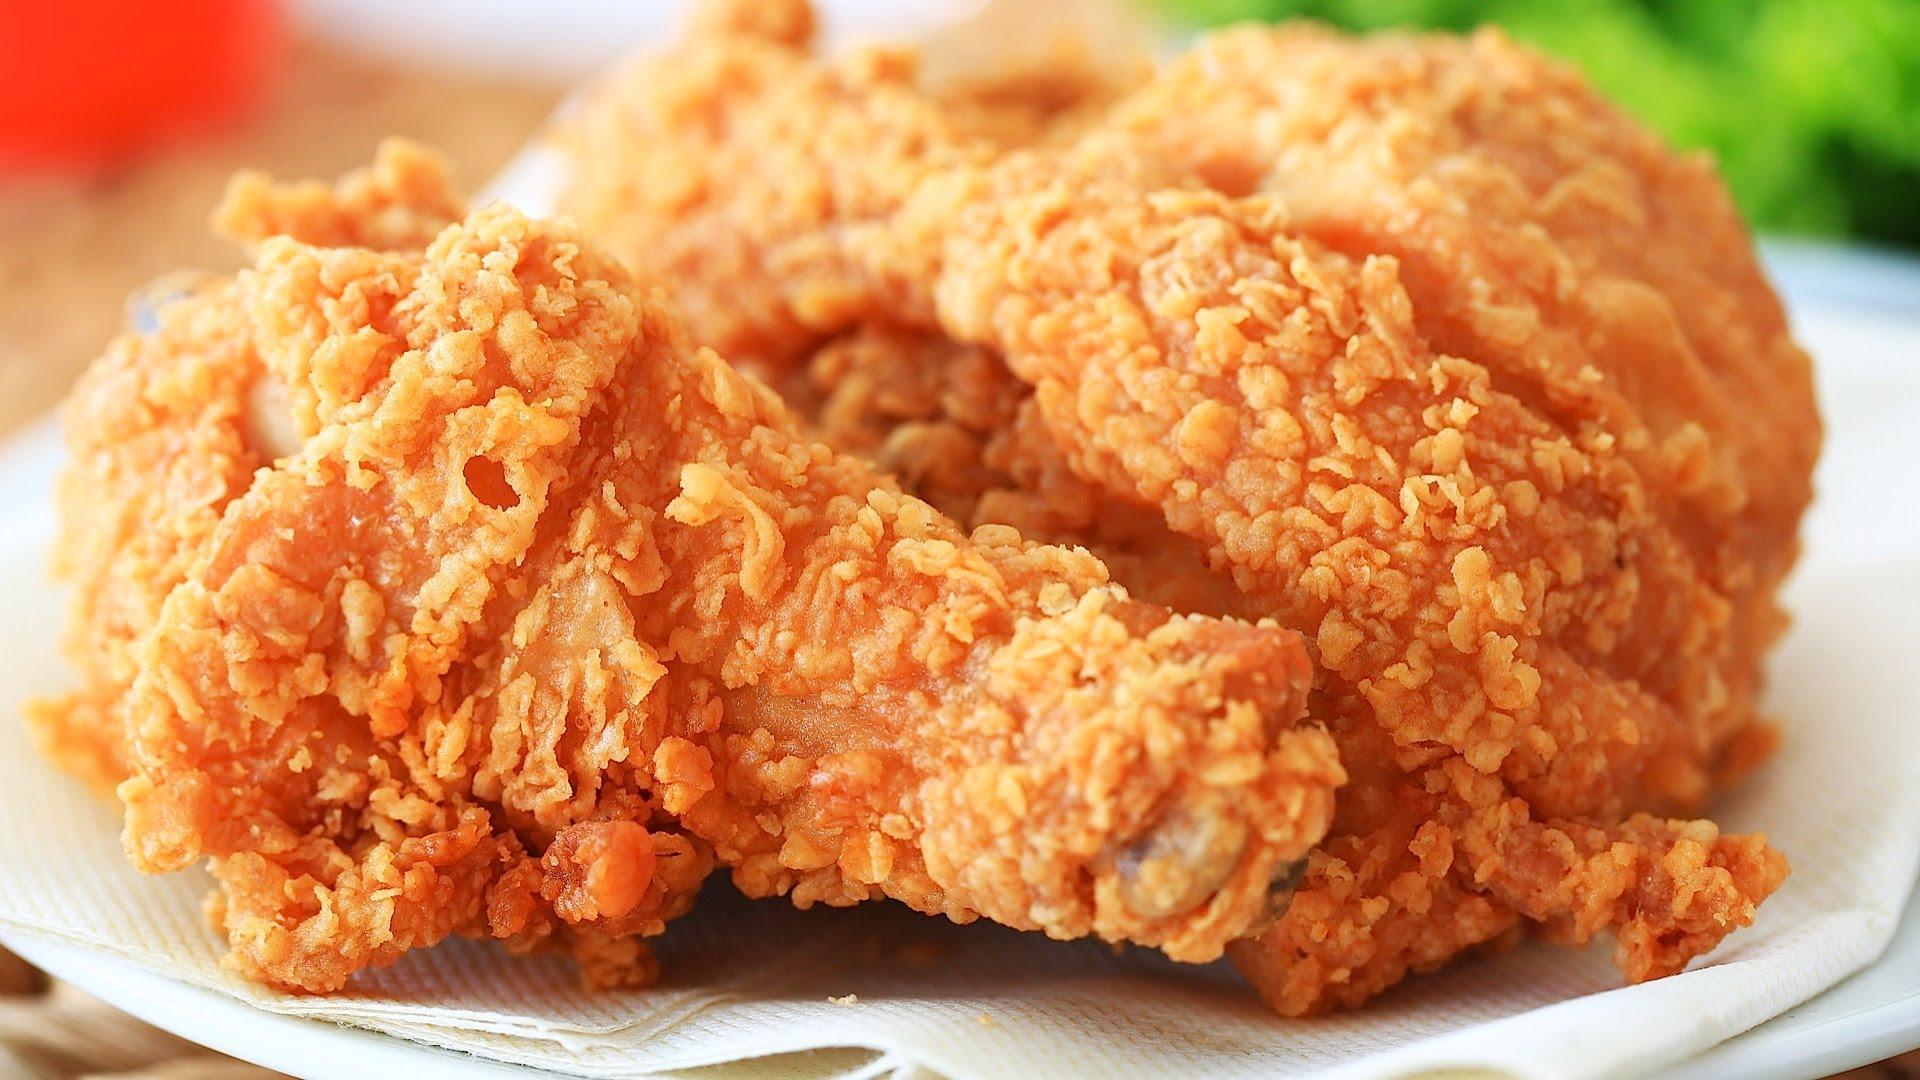 KFC fried chicken